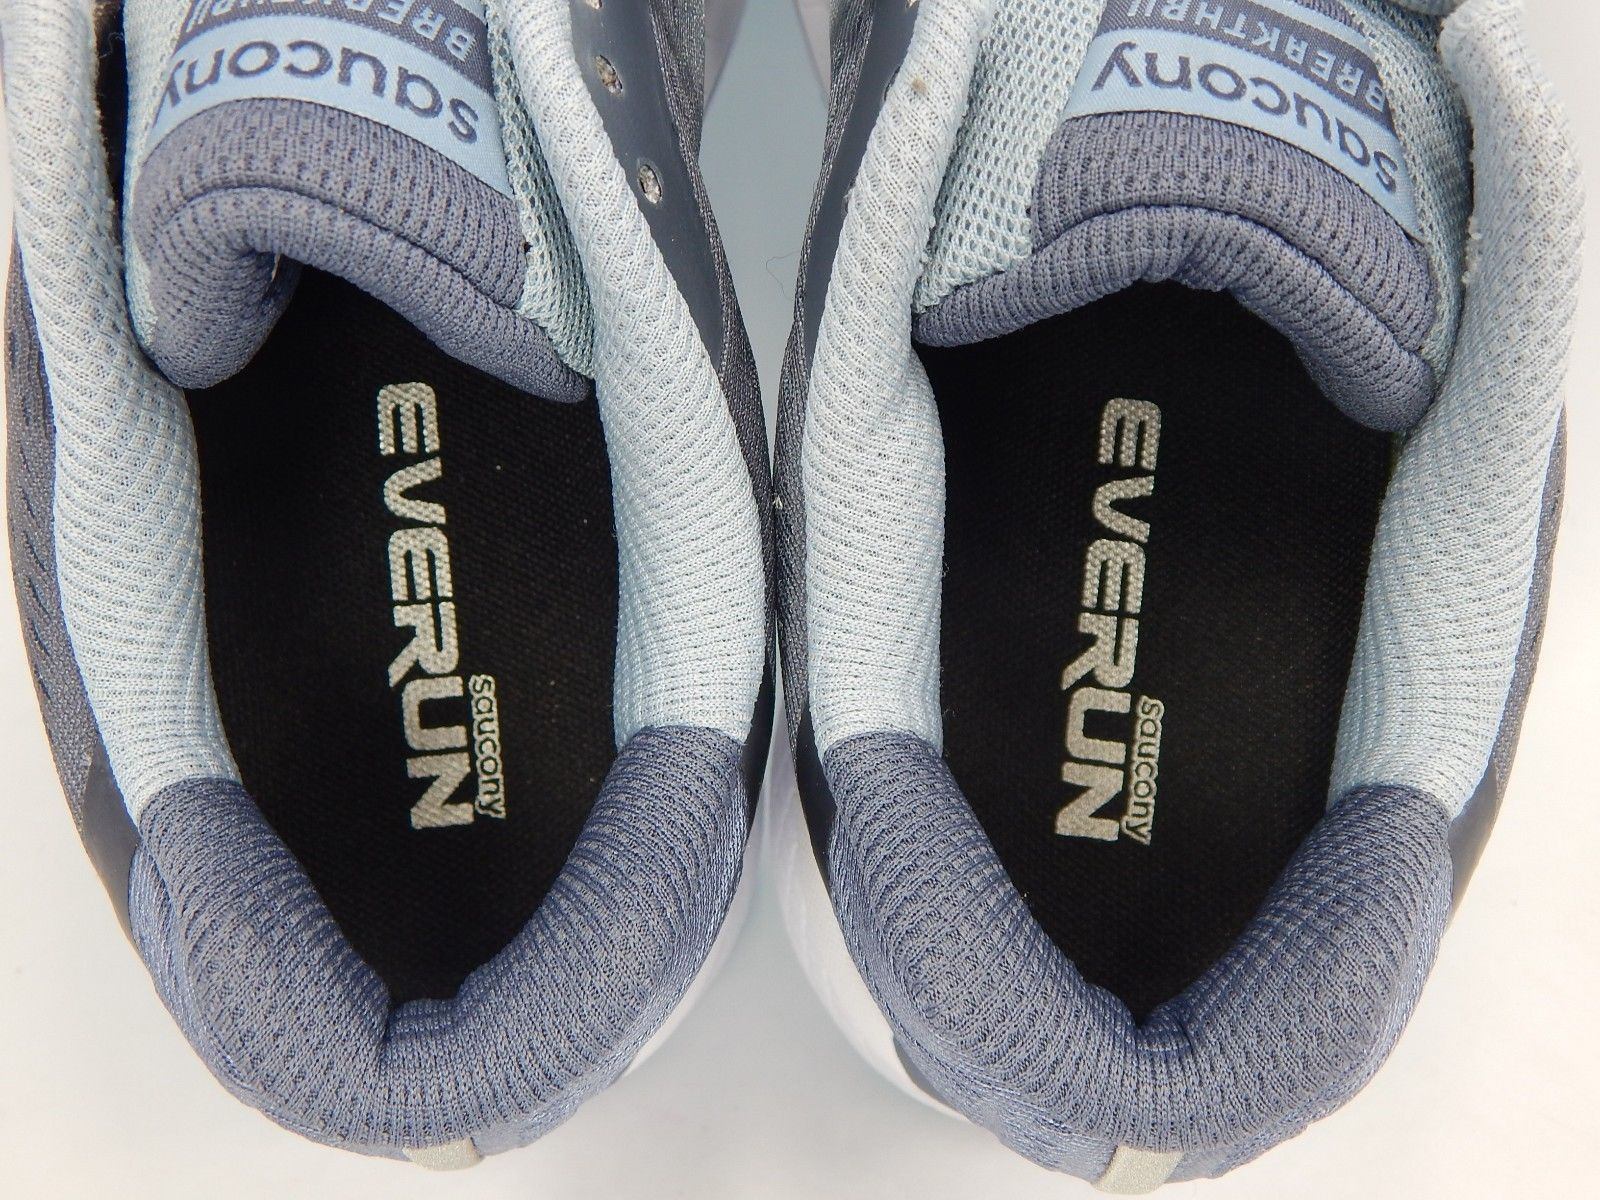 Saucony Breakthru 4 Size 7.5 M (B) EU 38.5 Women's Running Shoes Gray S10419-1